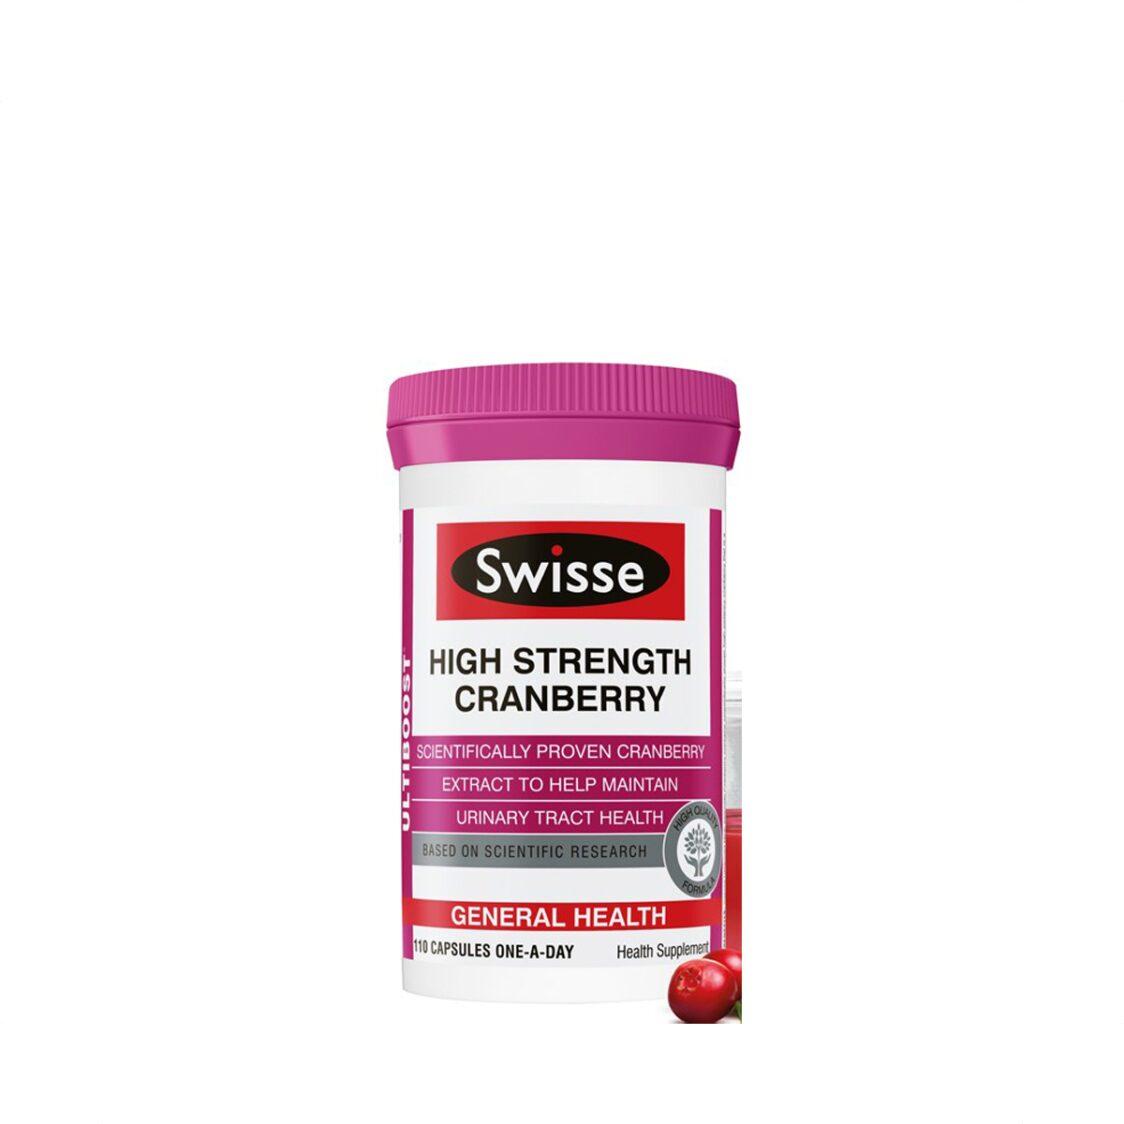 Swisse Ultiboost High Strength Cranberry 110s